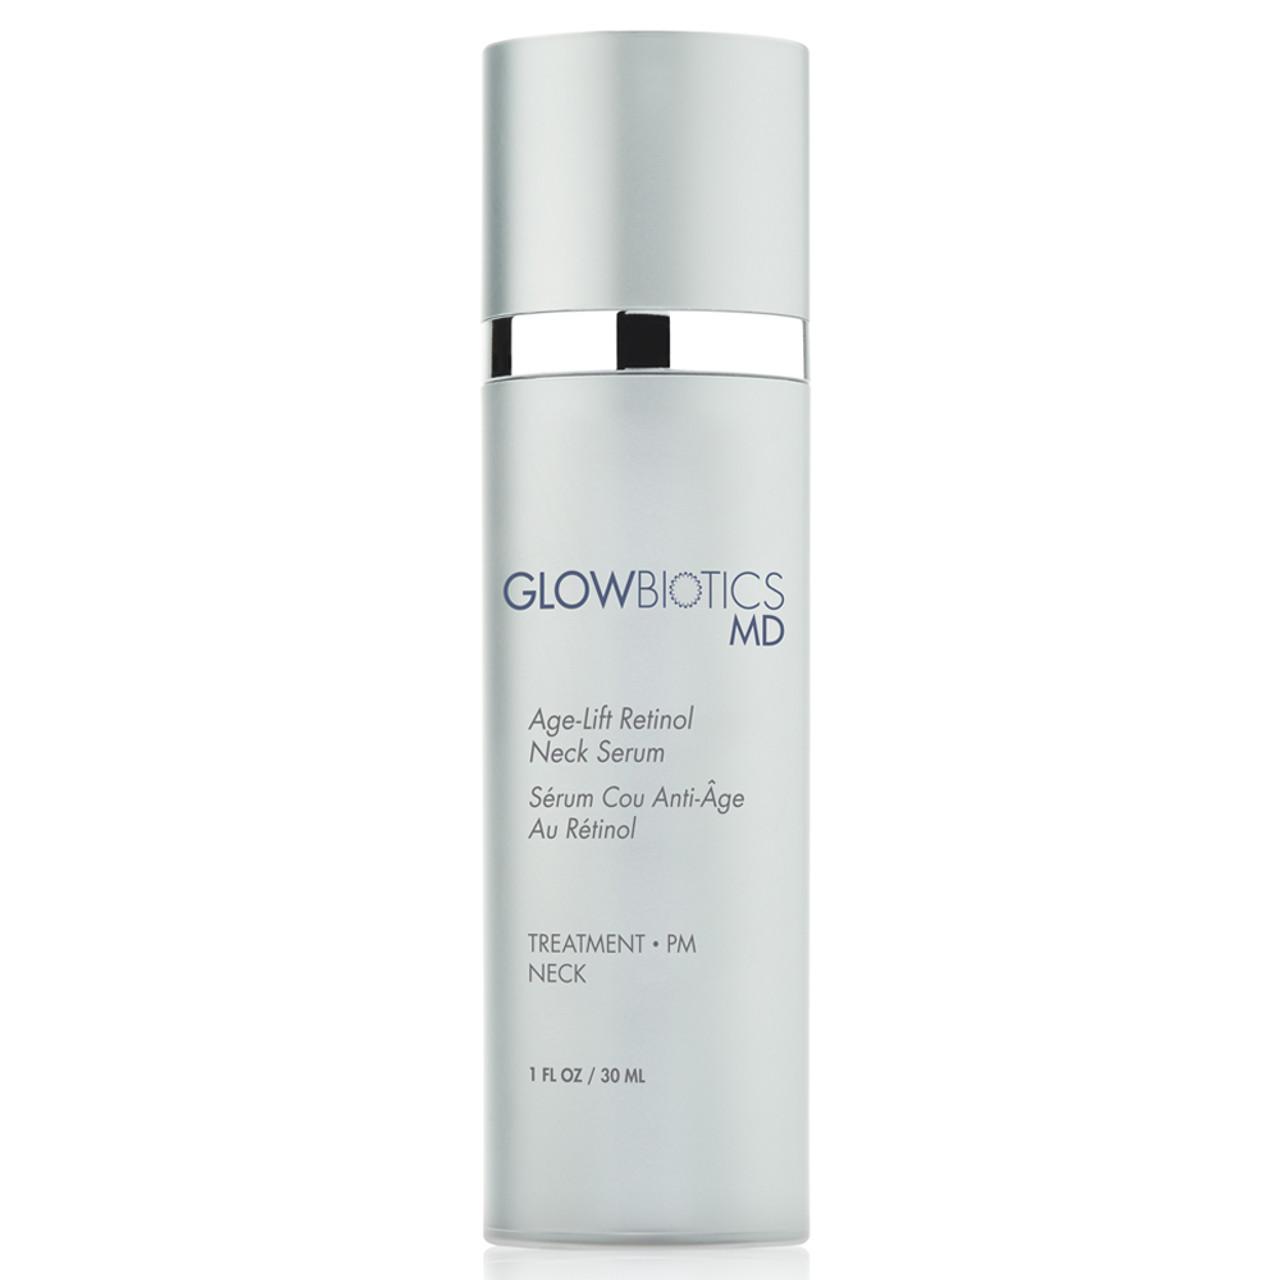 GlowbioticsMD Age-Lift Retinol Neck Serum